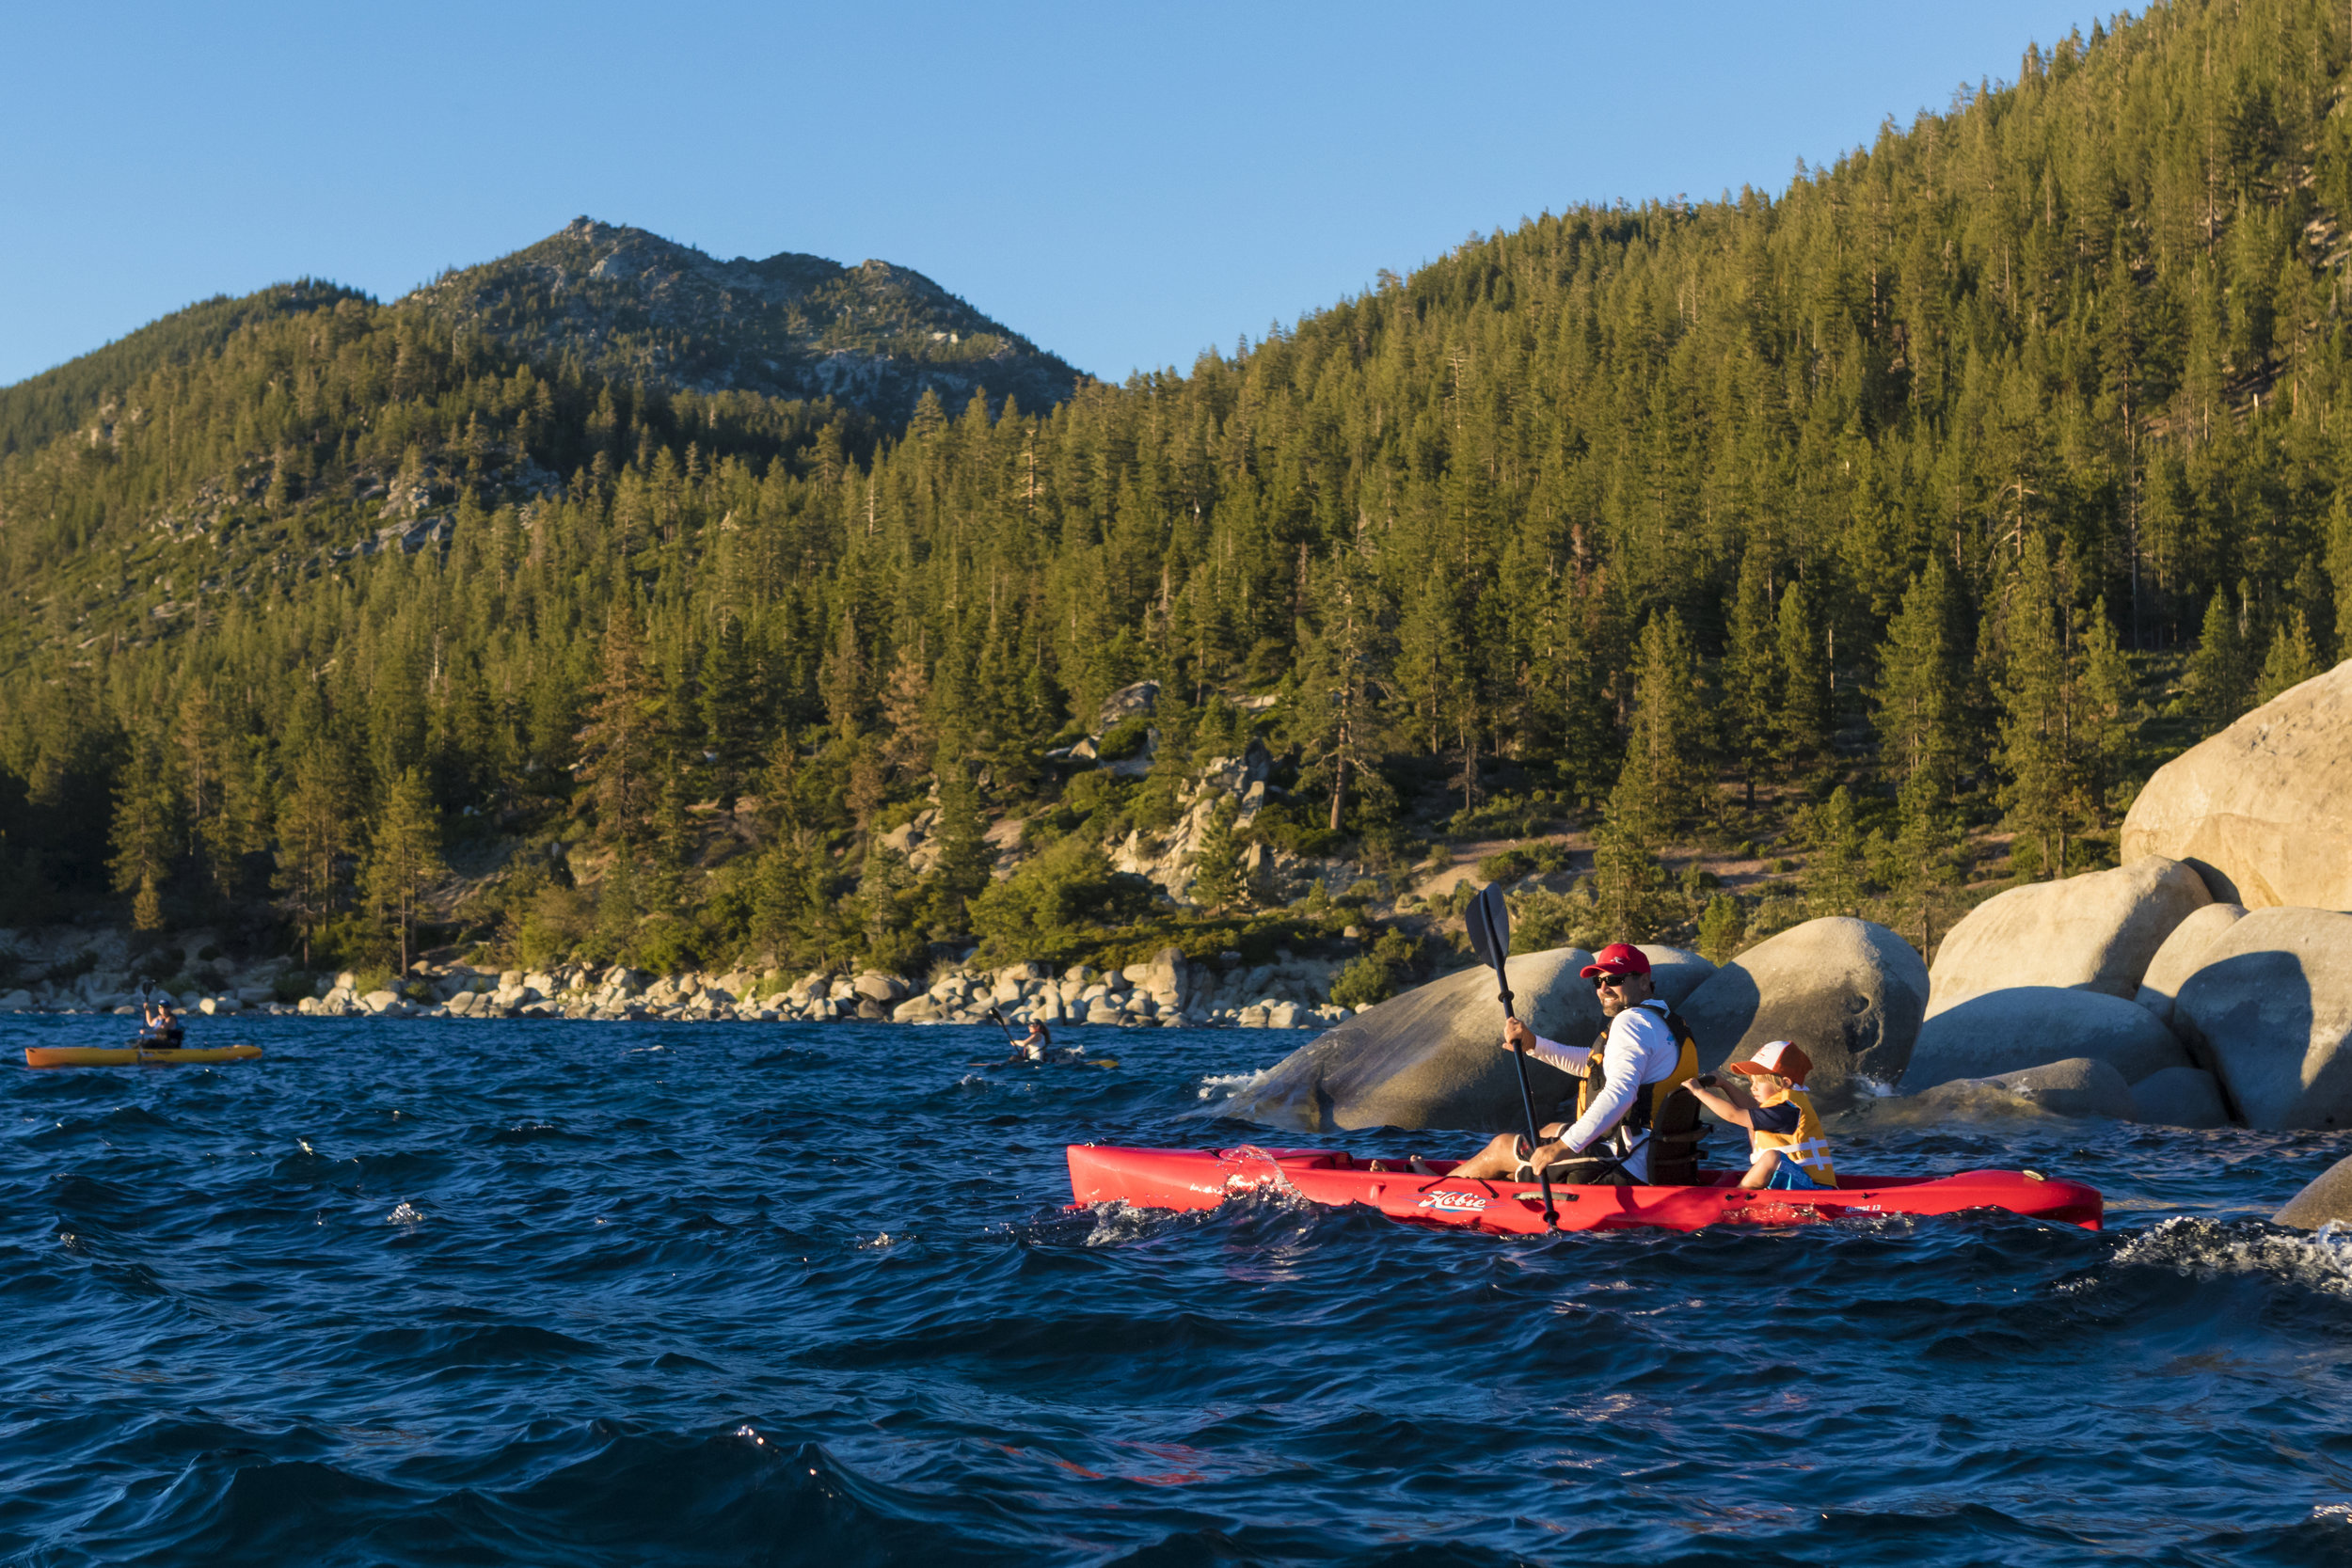 Quest13_action_Tahoe_choppy_Tobin_1745_full.jpg